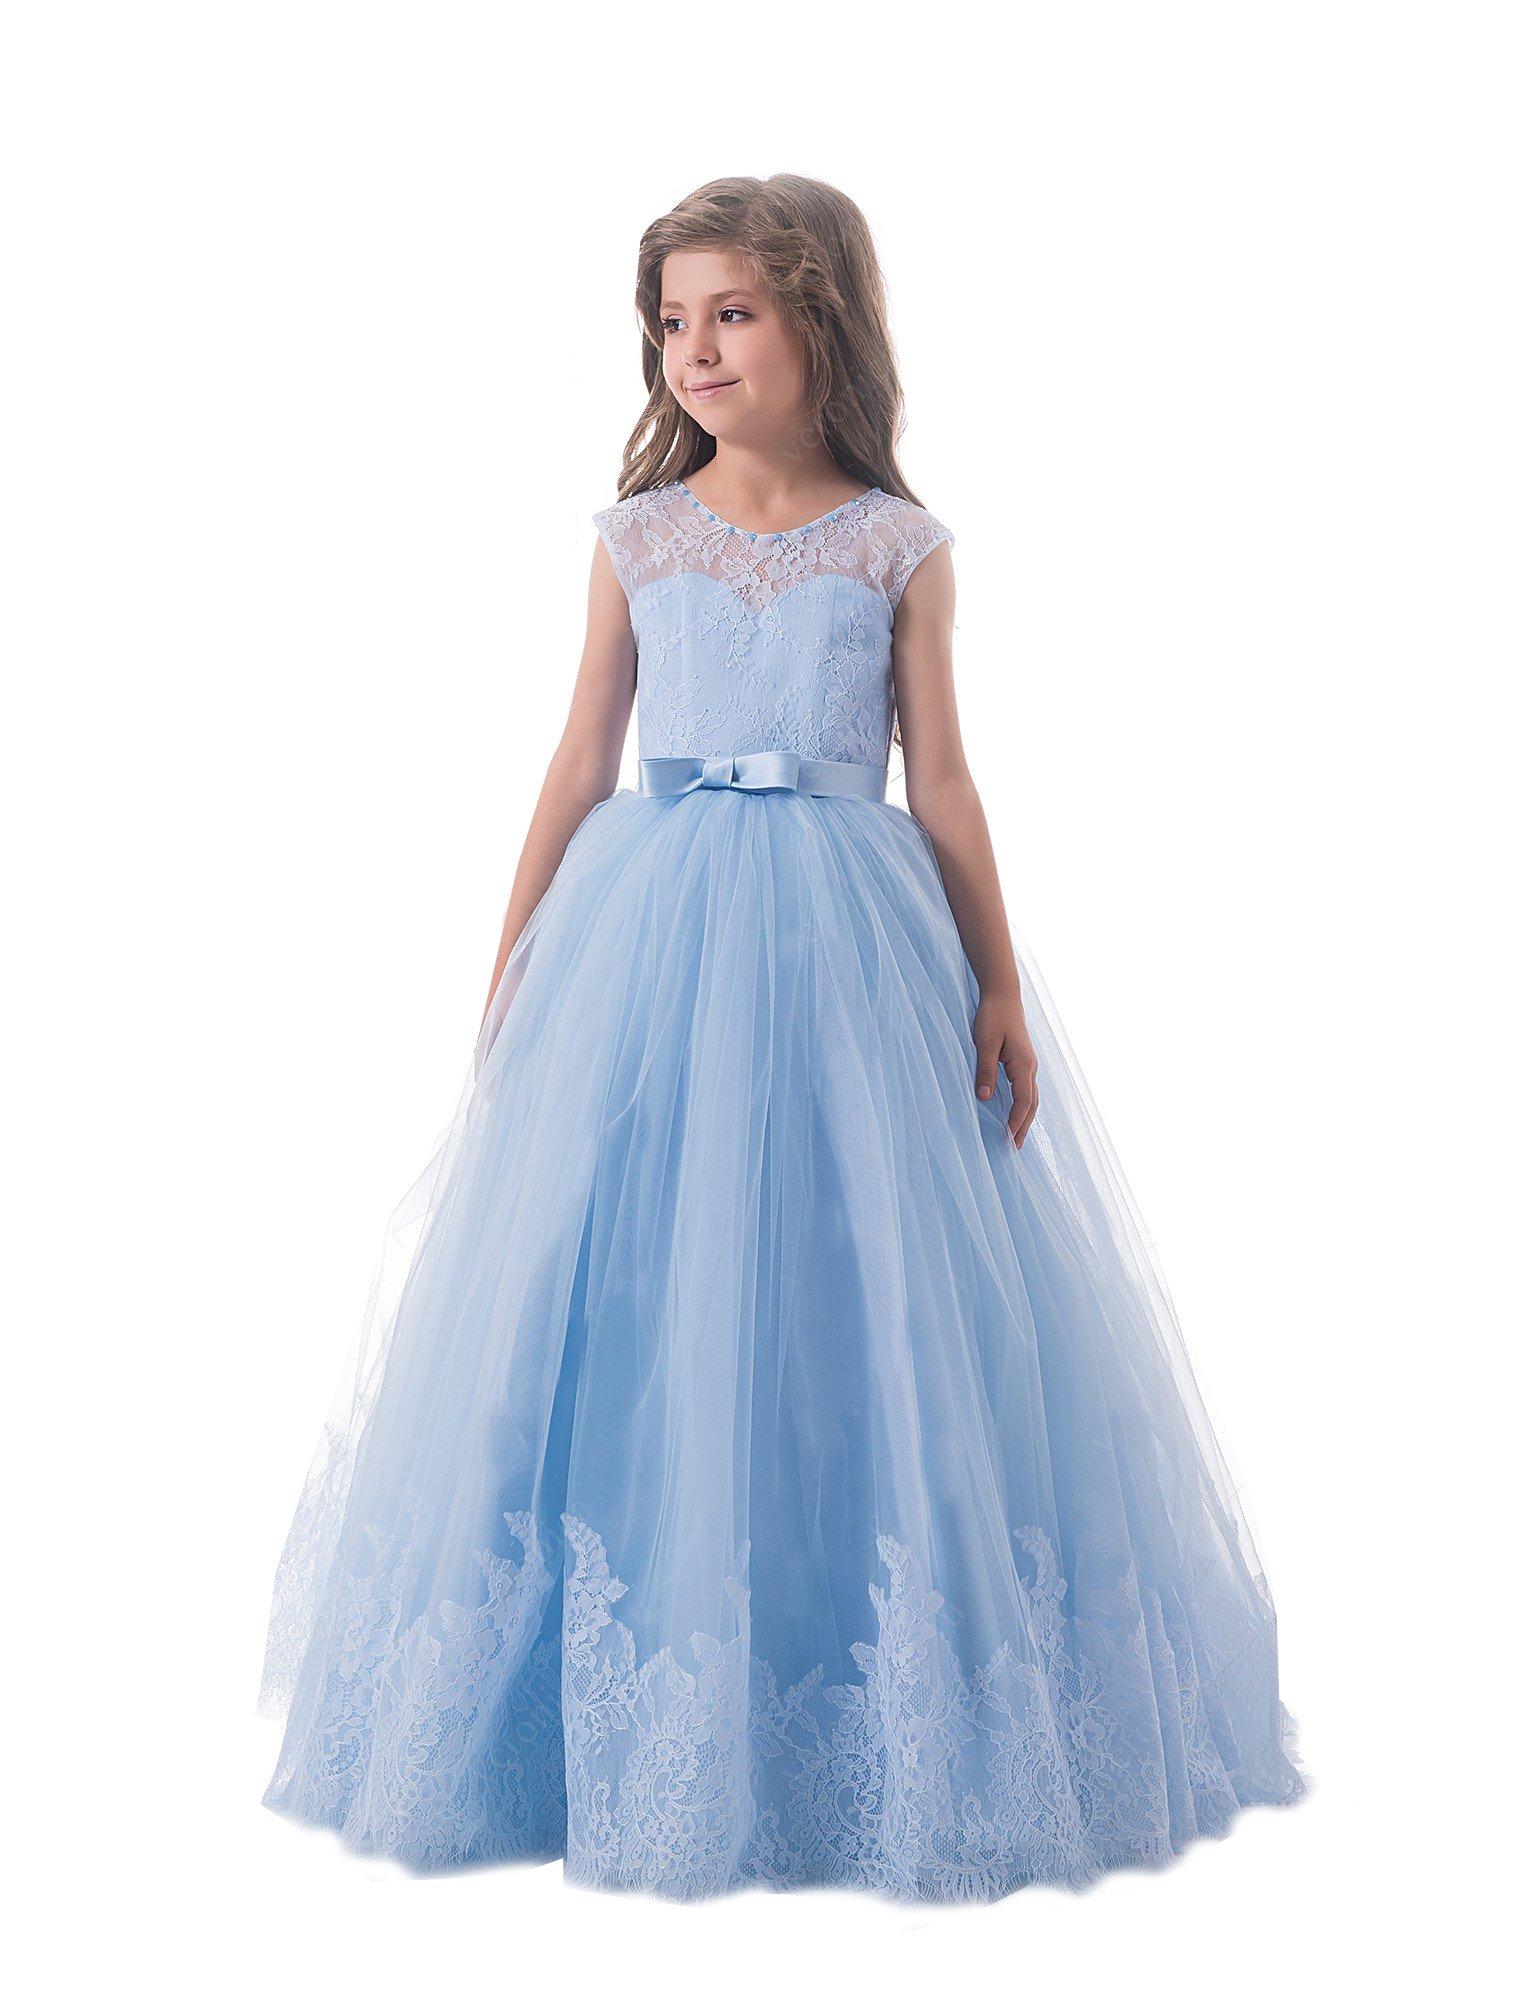 Nicefashion Girls Debutante Dresses Floor Length Wedding Dresses for Kids Blue US16